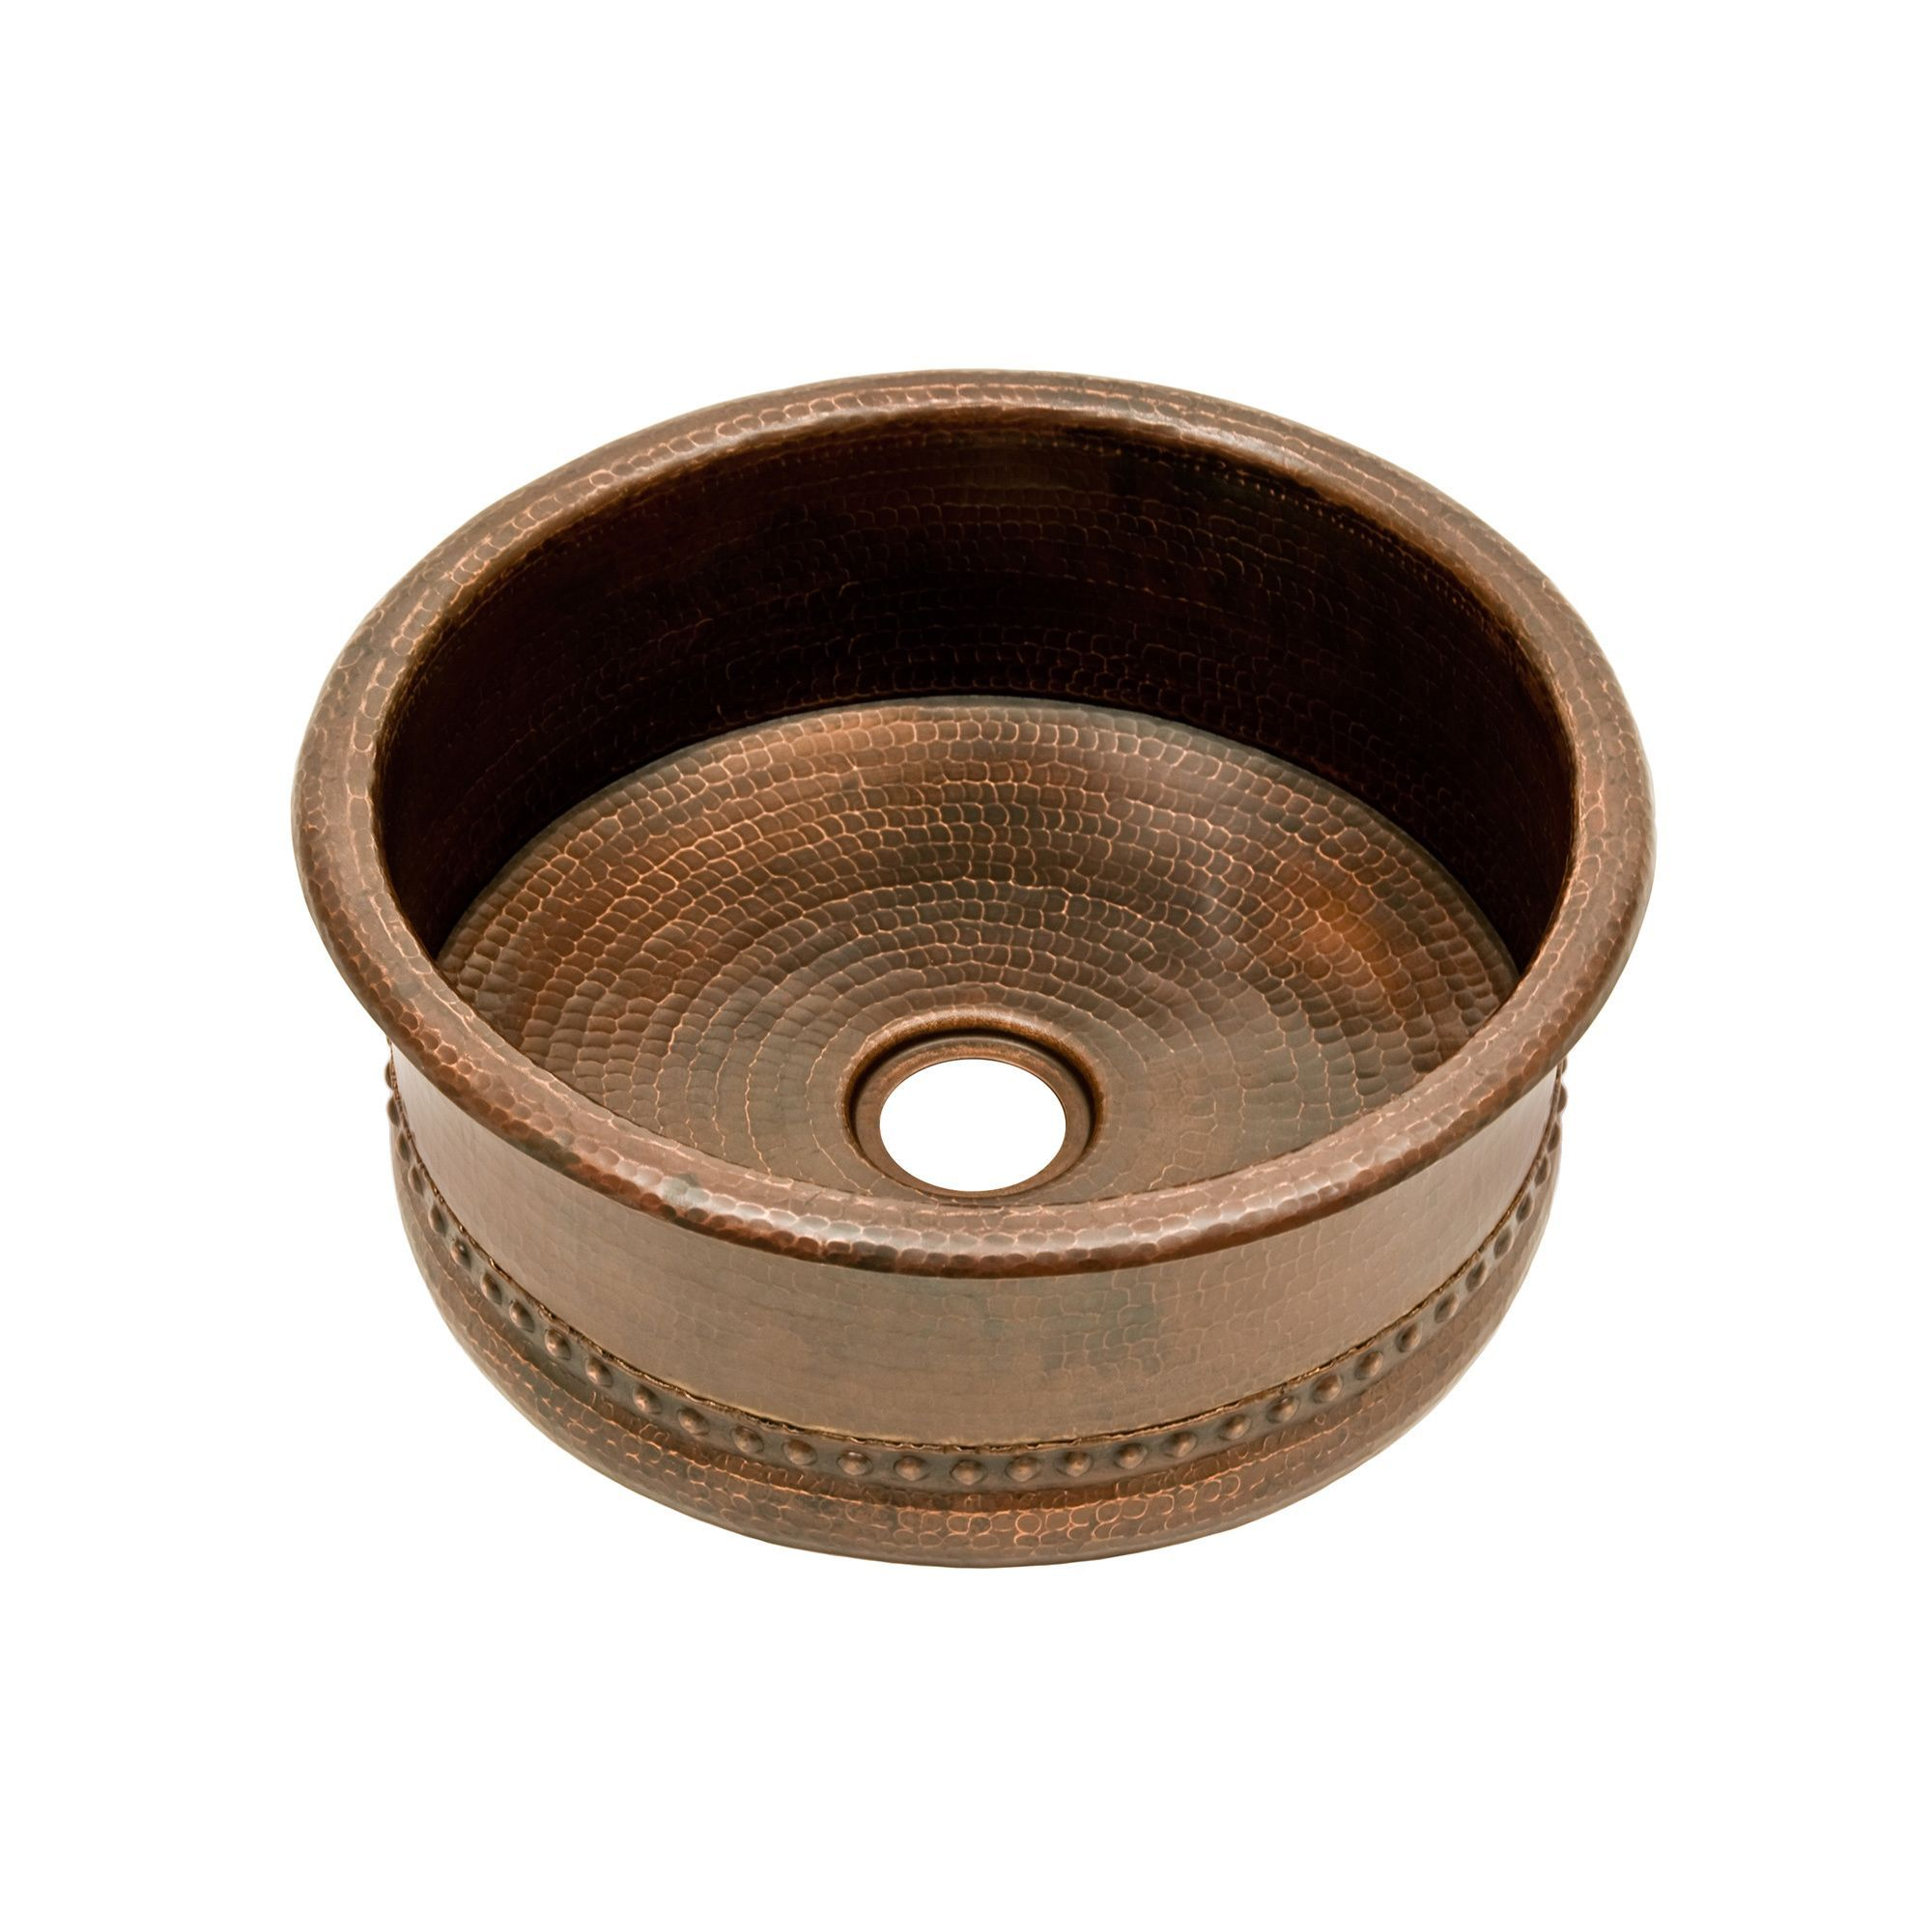 premier copper products 15 inch round bar vessel tub sink 2 bar